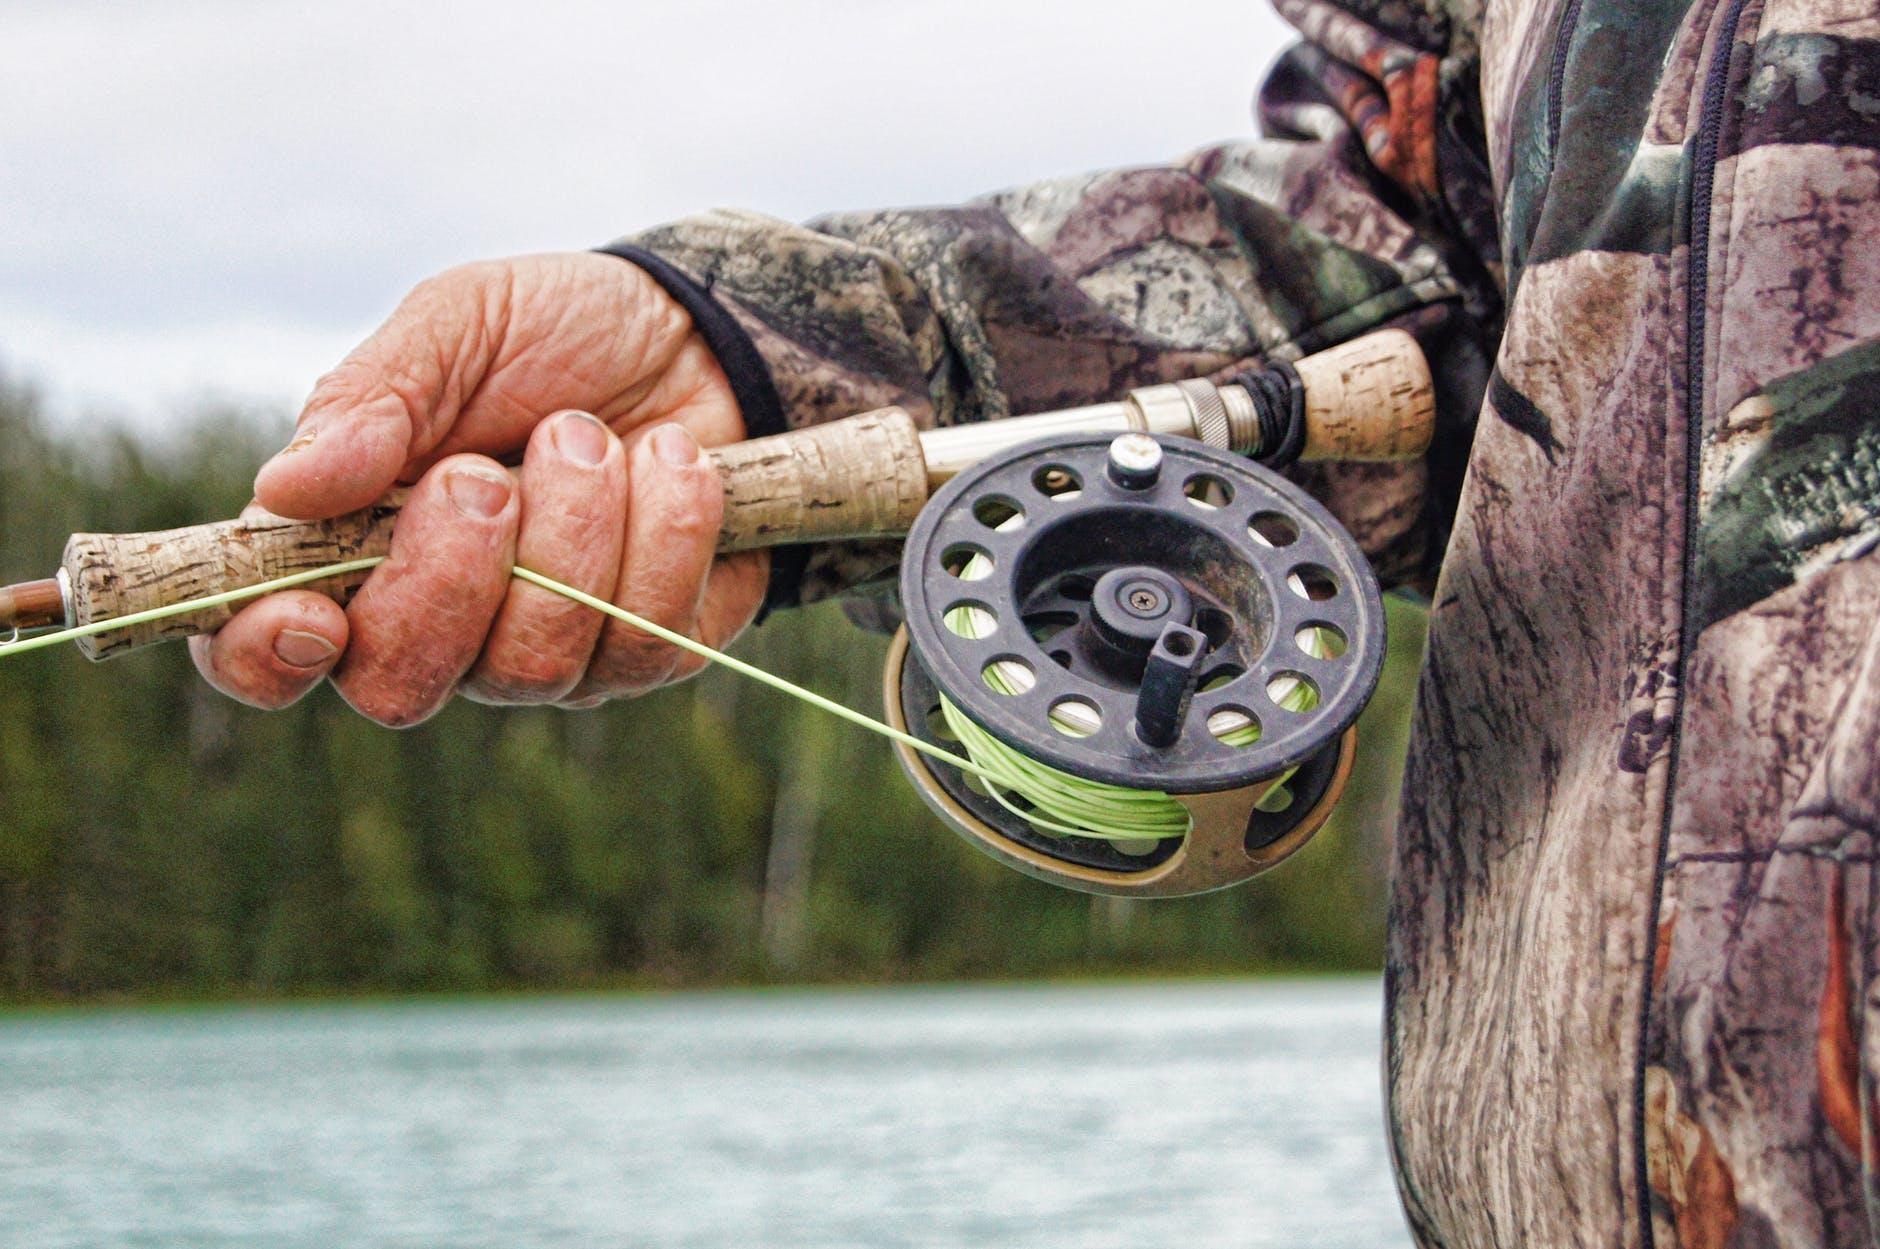 mand med fiskestang